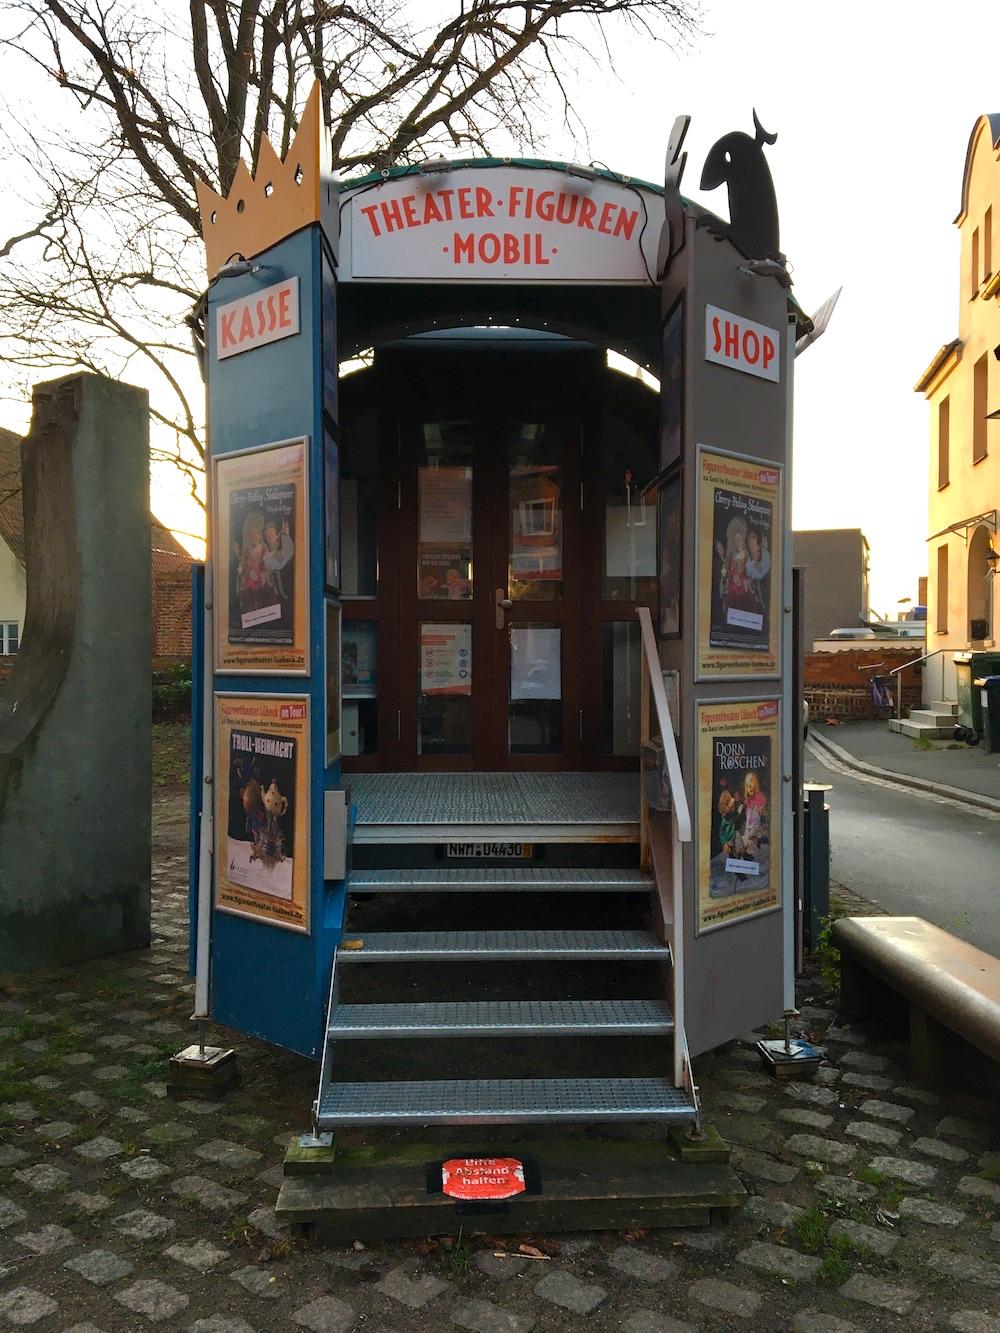 TheaterFigurenMobil Objekt der Woche